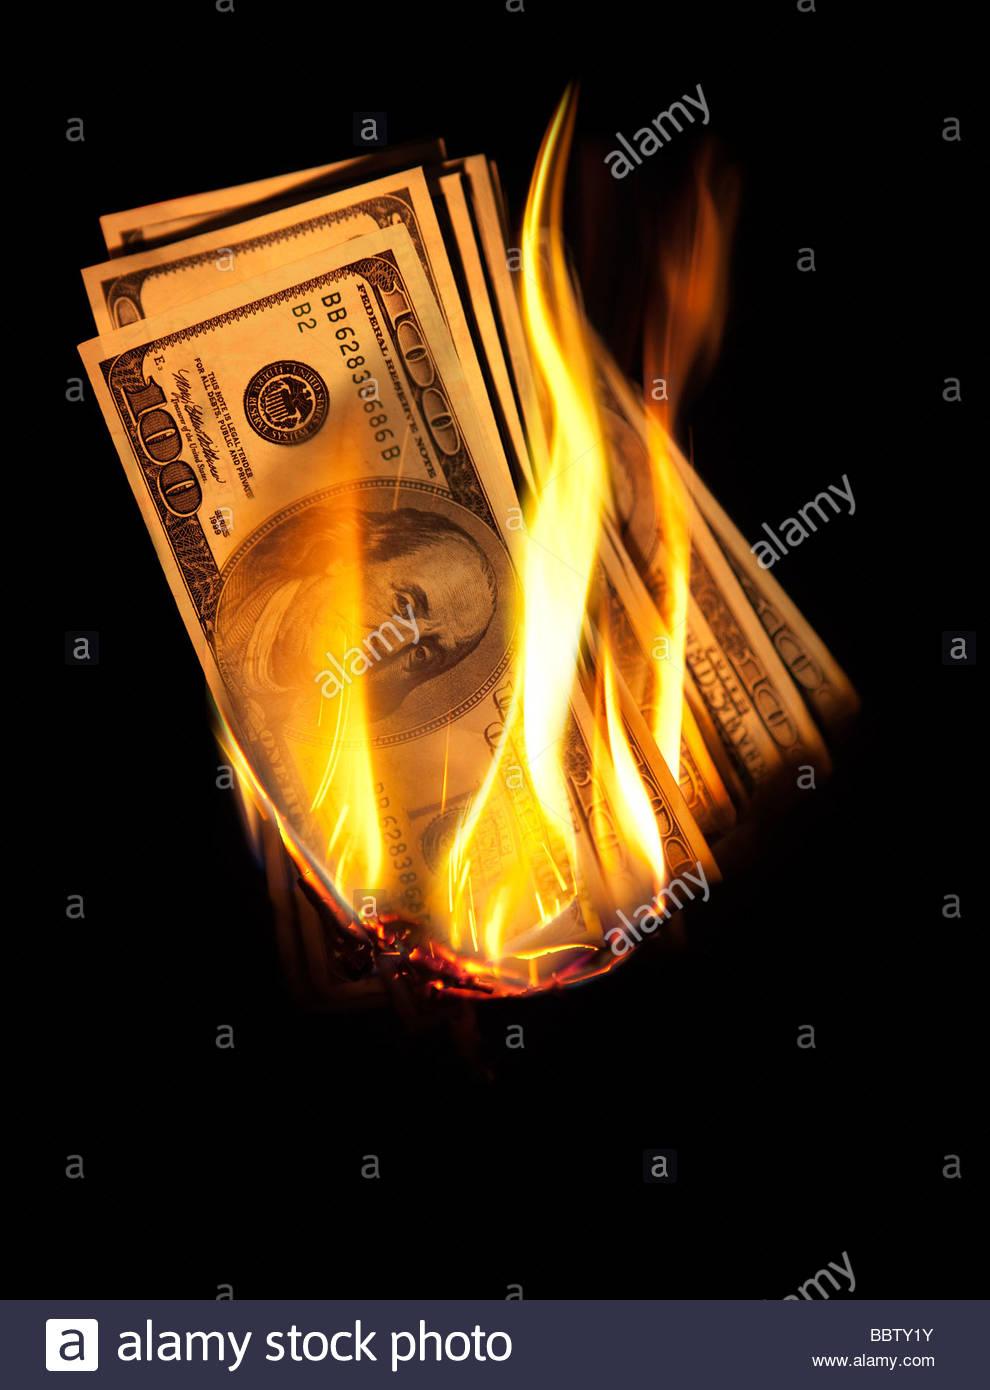 Bundle of US $100 bills burning. - Stock Image